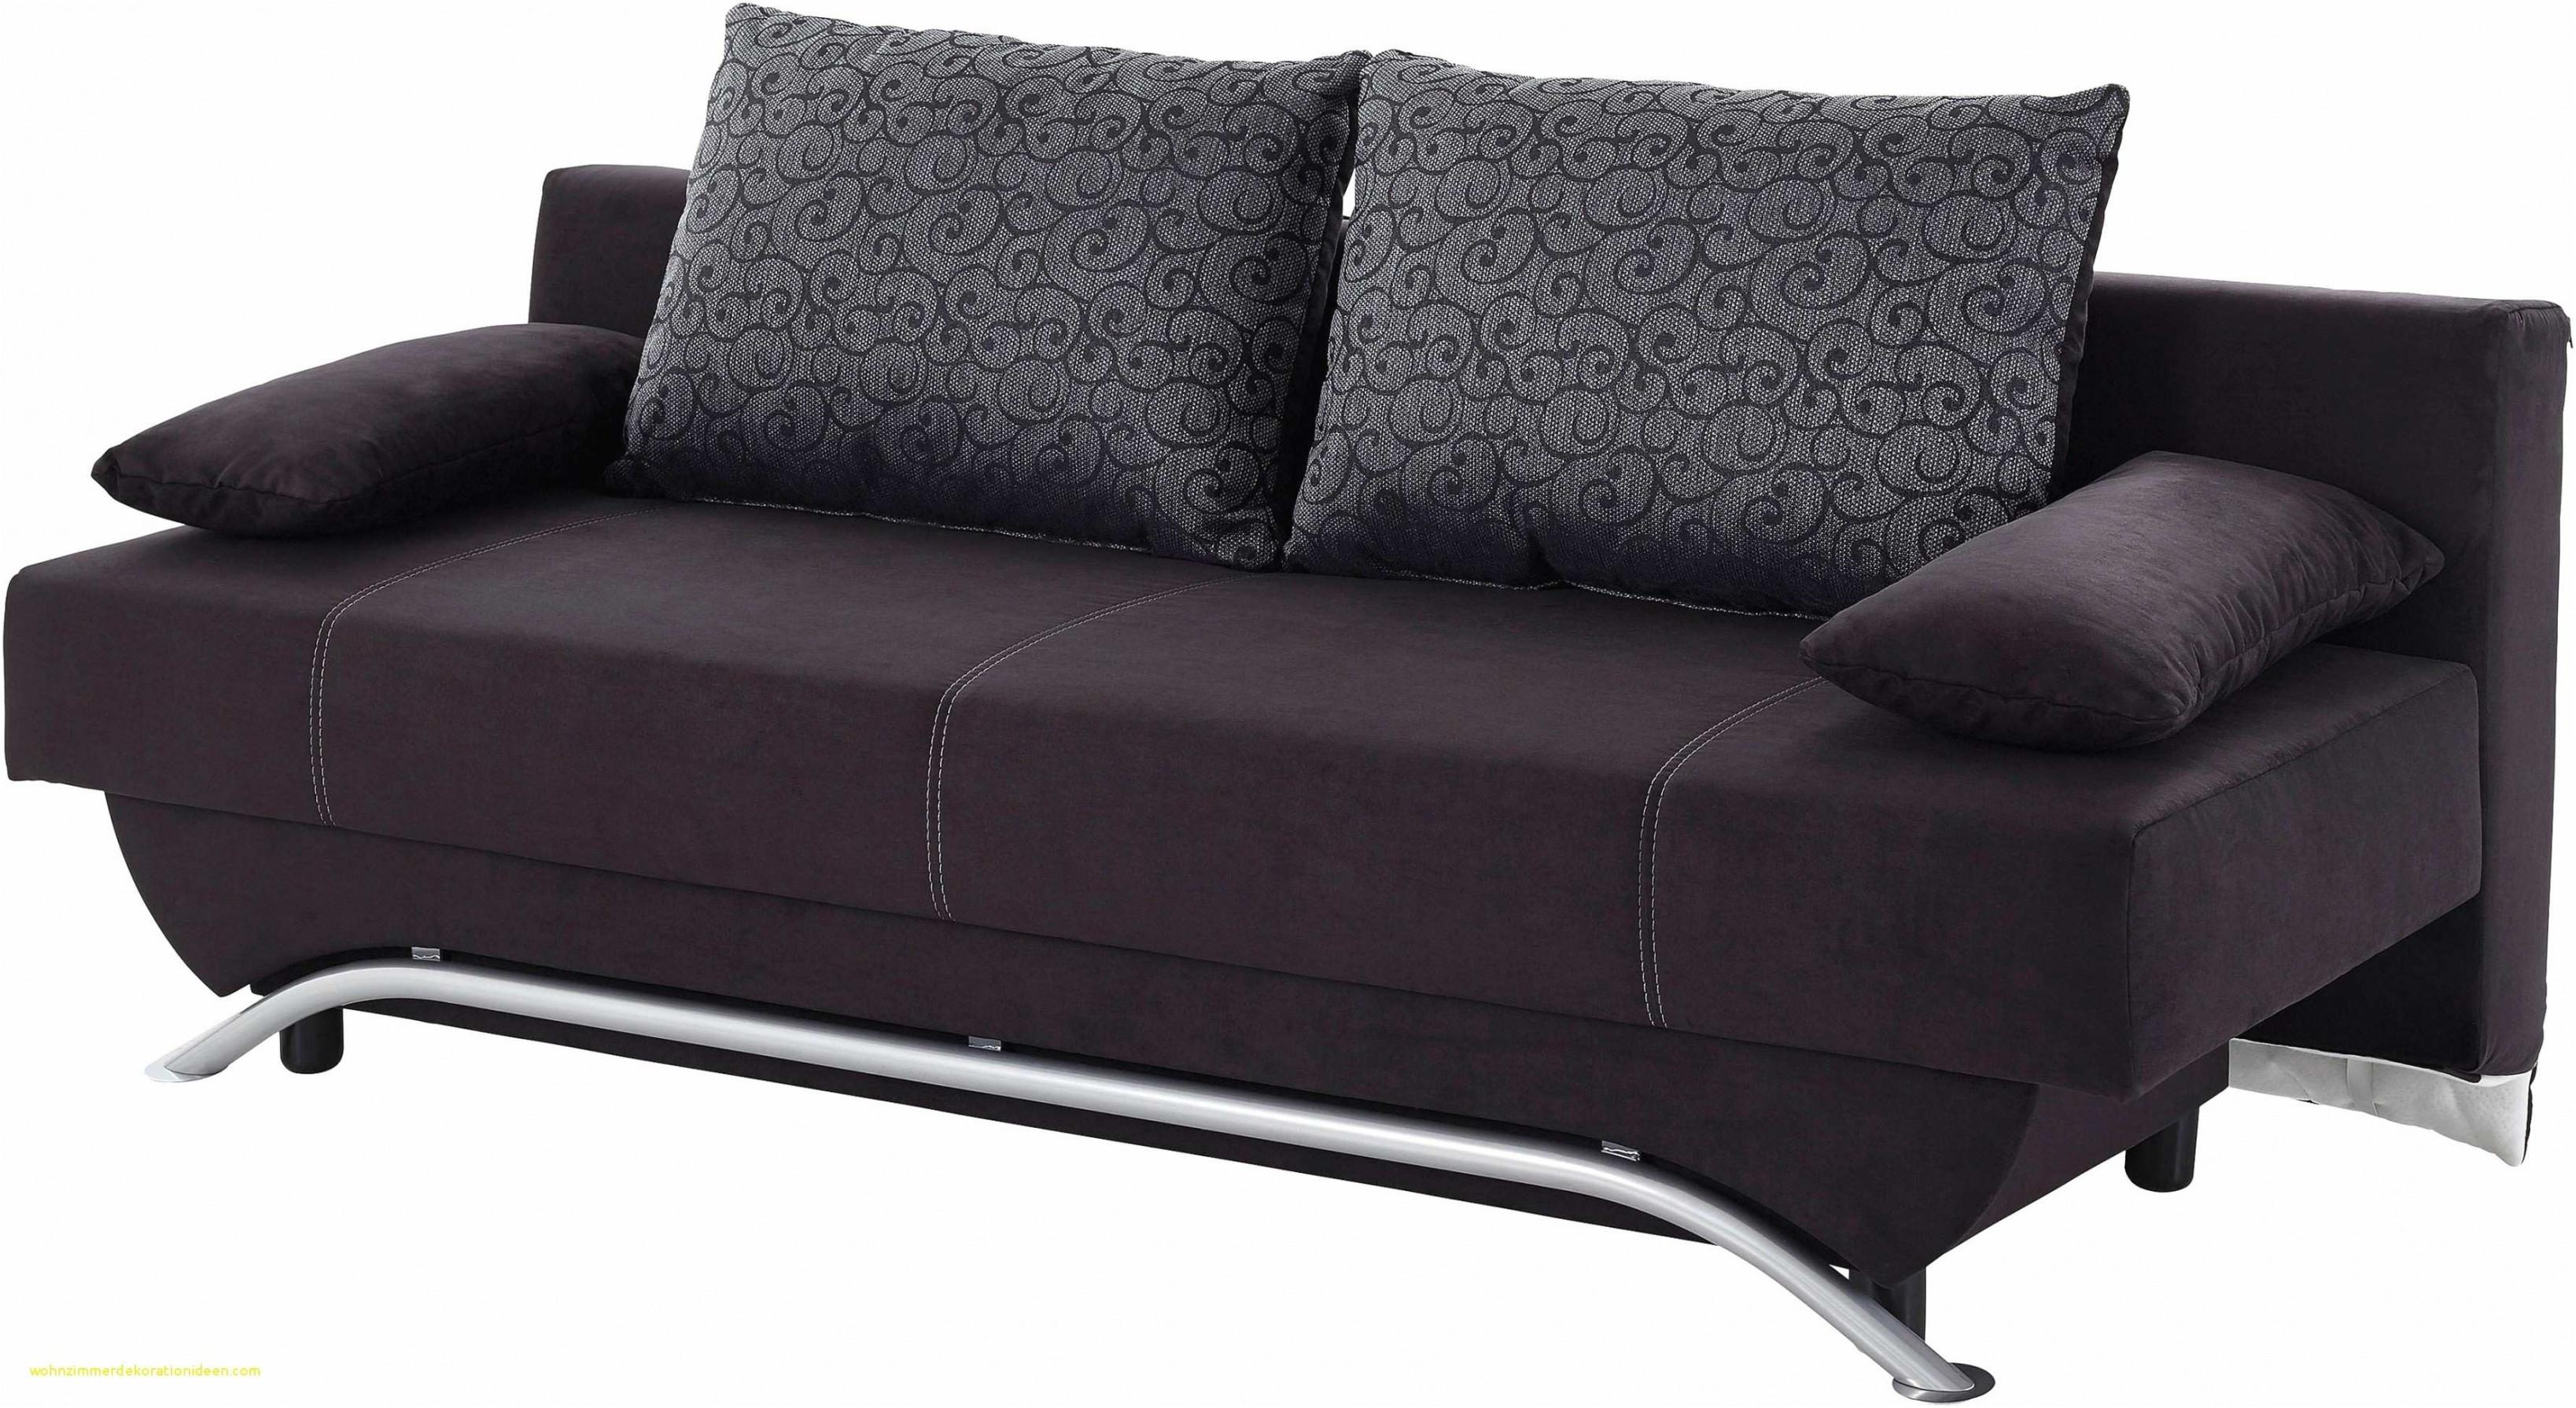 sofas cama ikea 2 plazas a nico schlafcouch 2er perfect schlafcouch ikea lycksele hvet erbettsofa